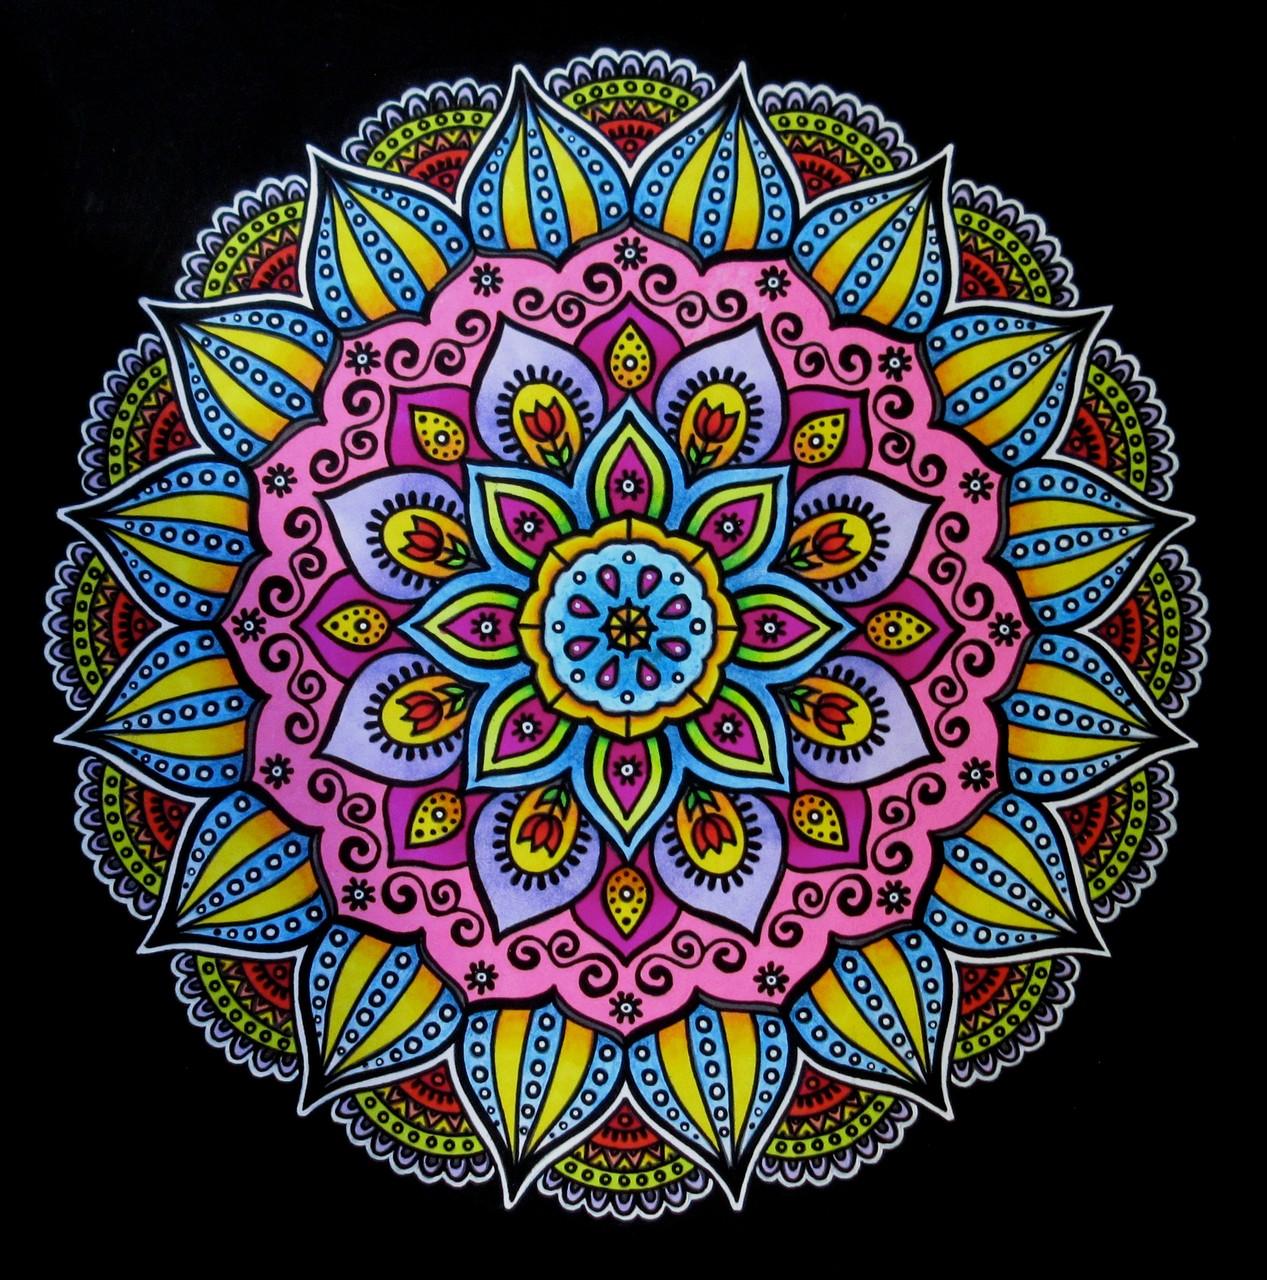 "Mandala design from ""Dynamic Mandala Patterns"", markers, gel pens & pencils on paper, Feb.2016"